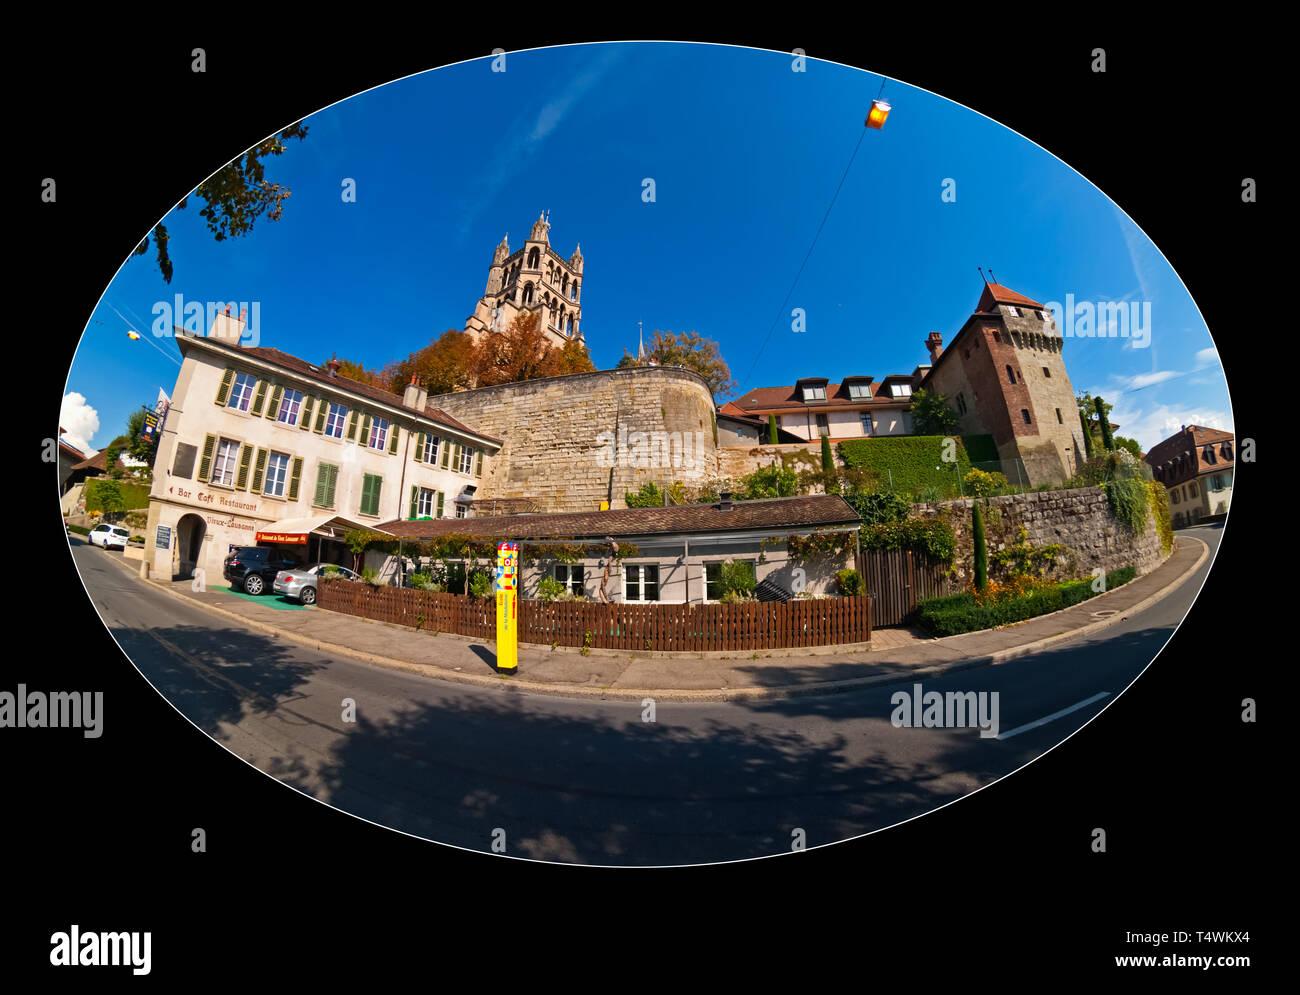 Lausanne City in Vaud Canton (Switzerland). The city is located near Lake Geneva - Stock Image